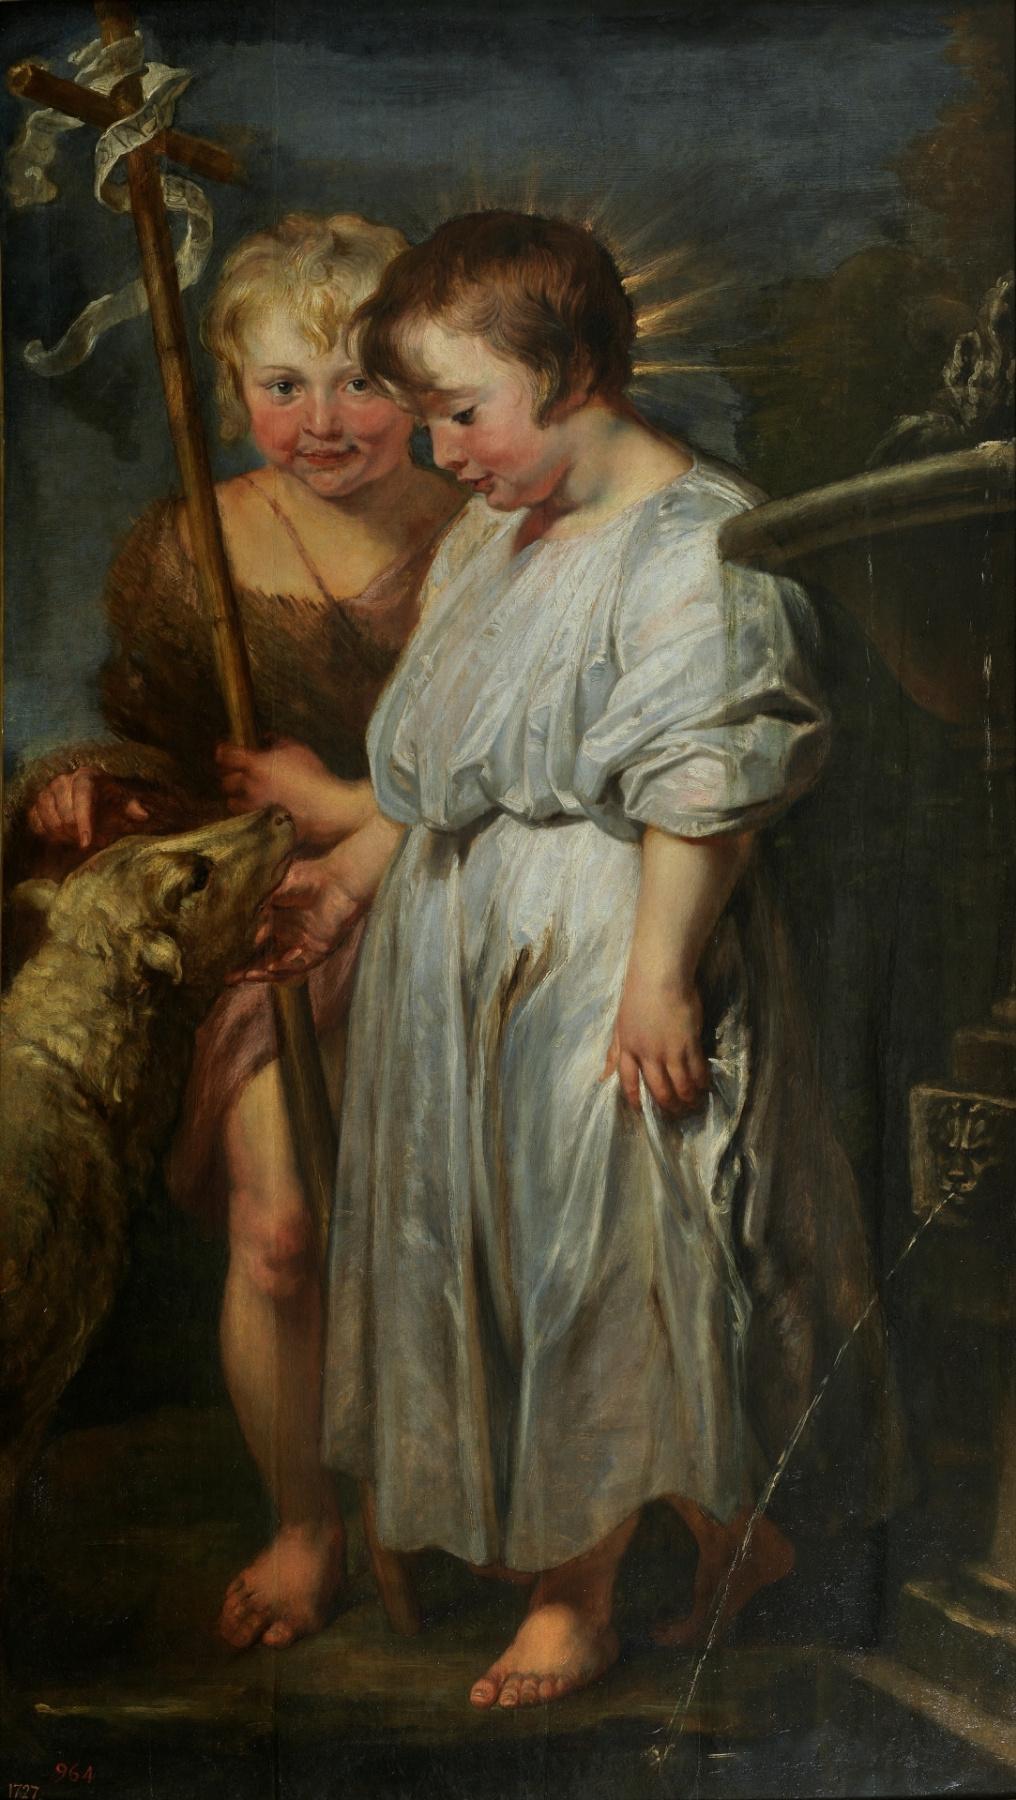 Anthony van Dyck. Boy Christ, Saint John the Baptist and the lamb